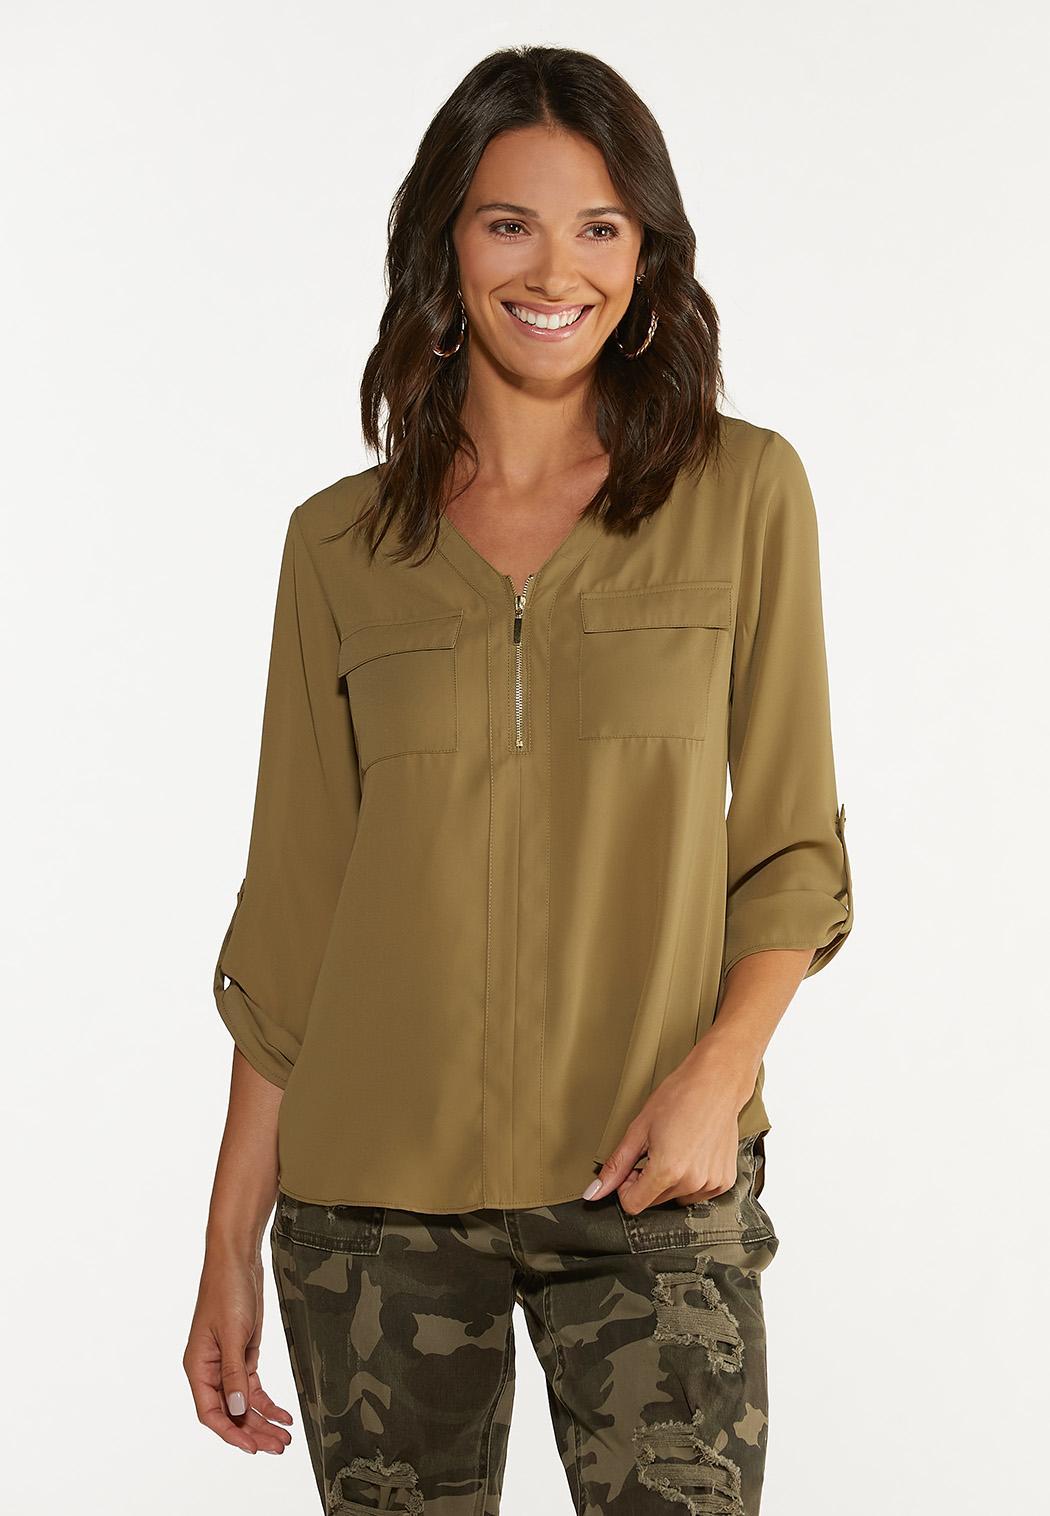 Plus Size Solid Equipment Shirt